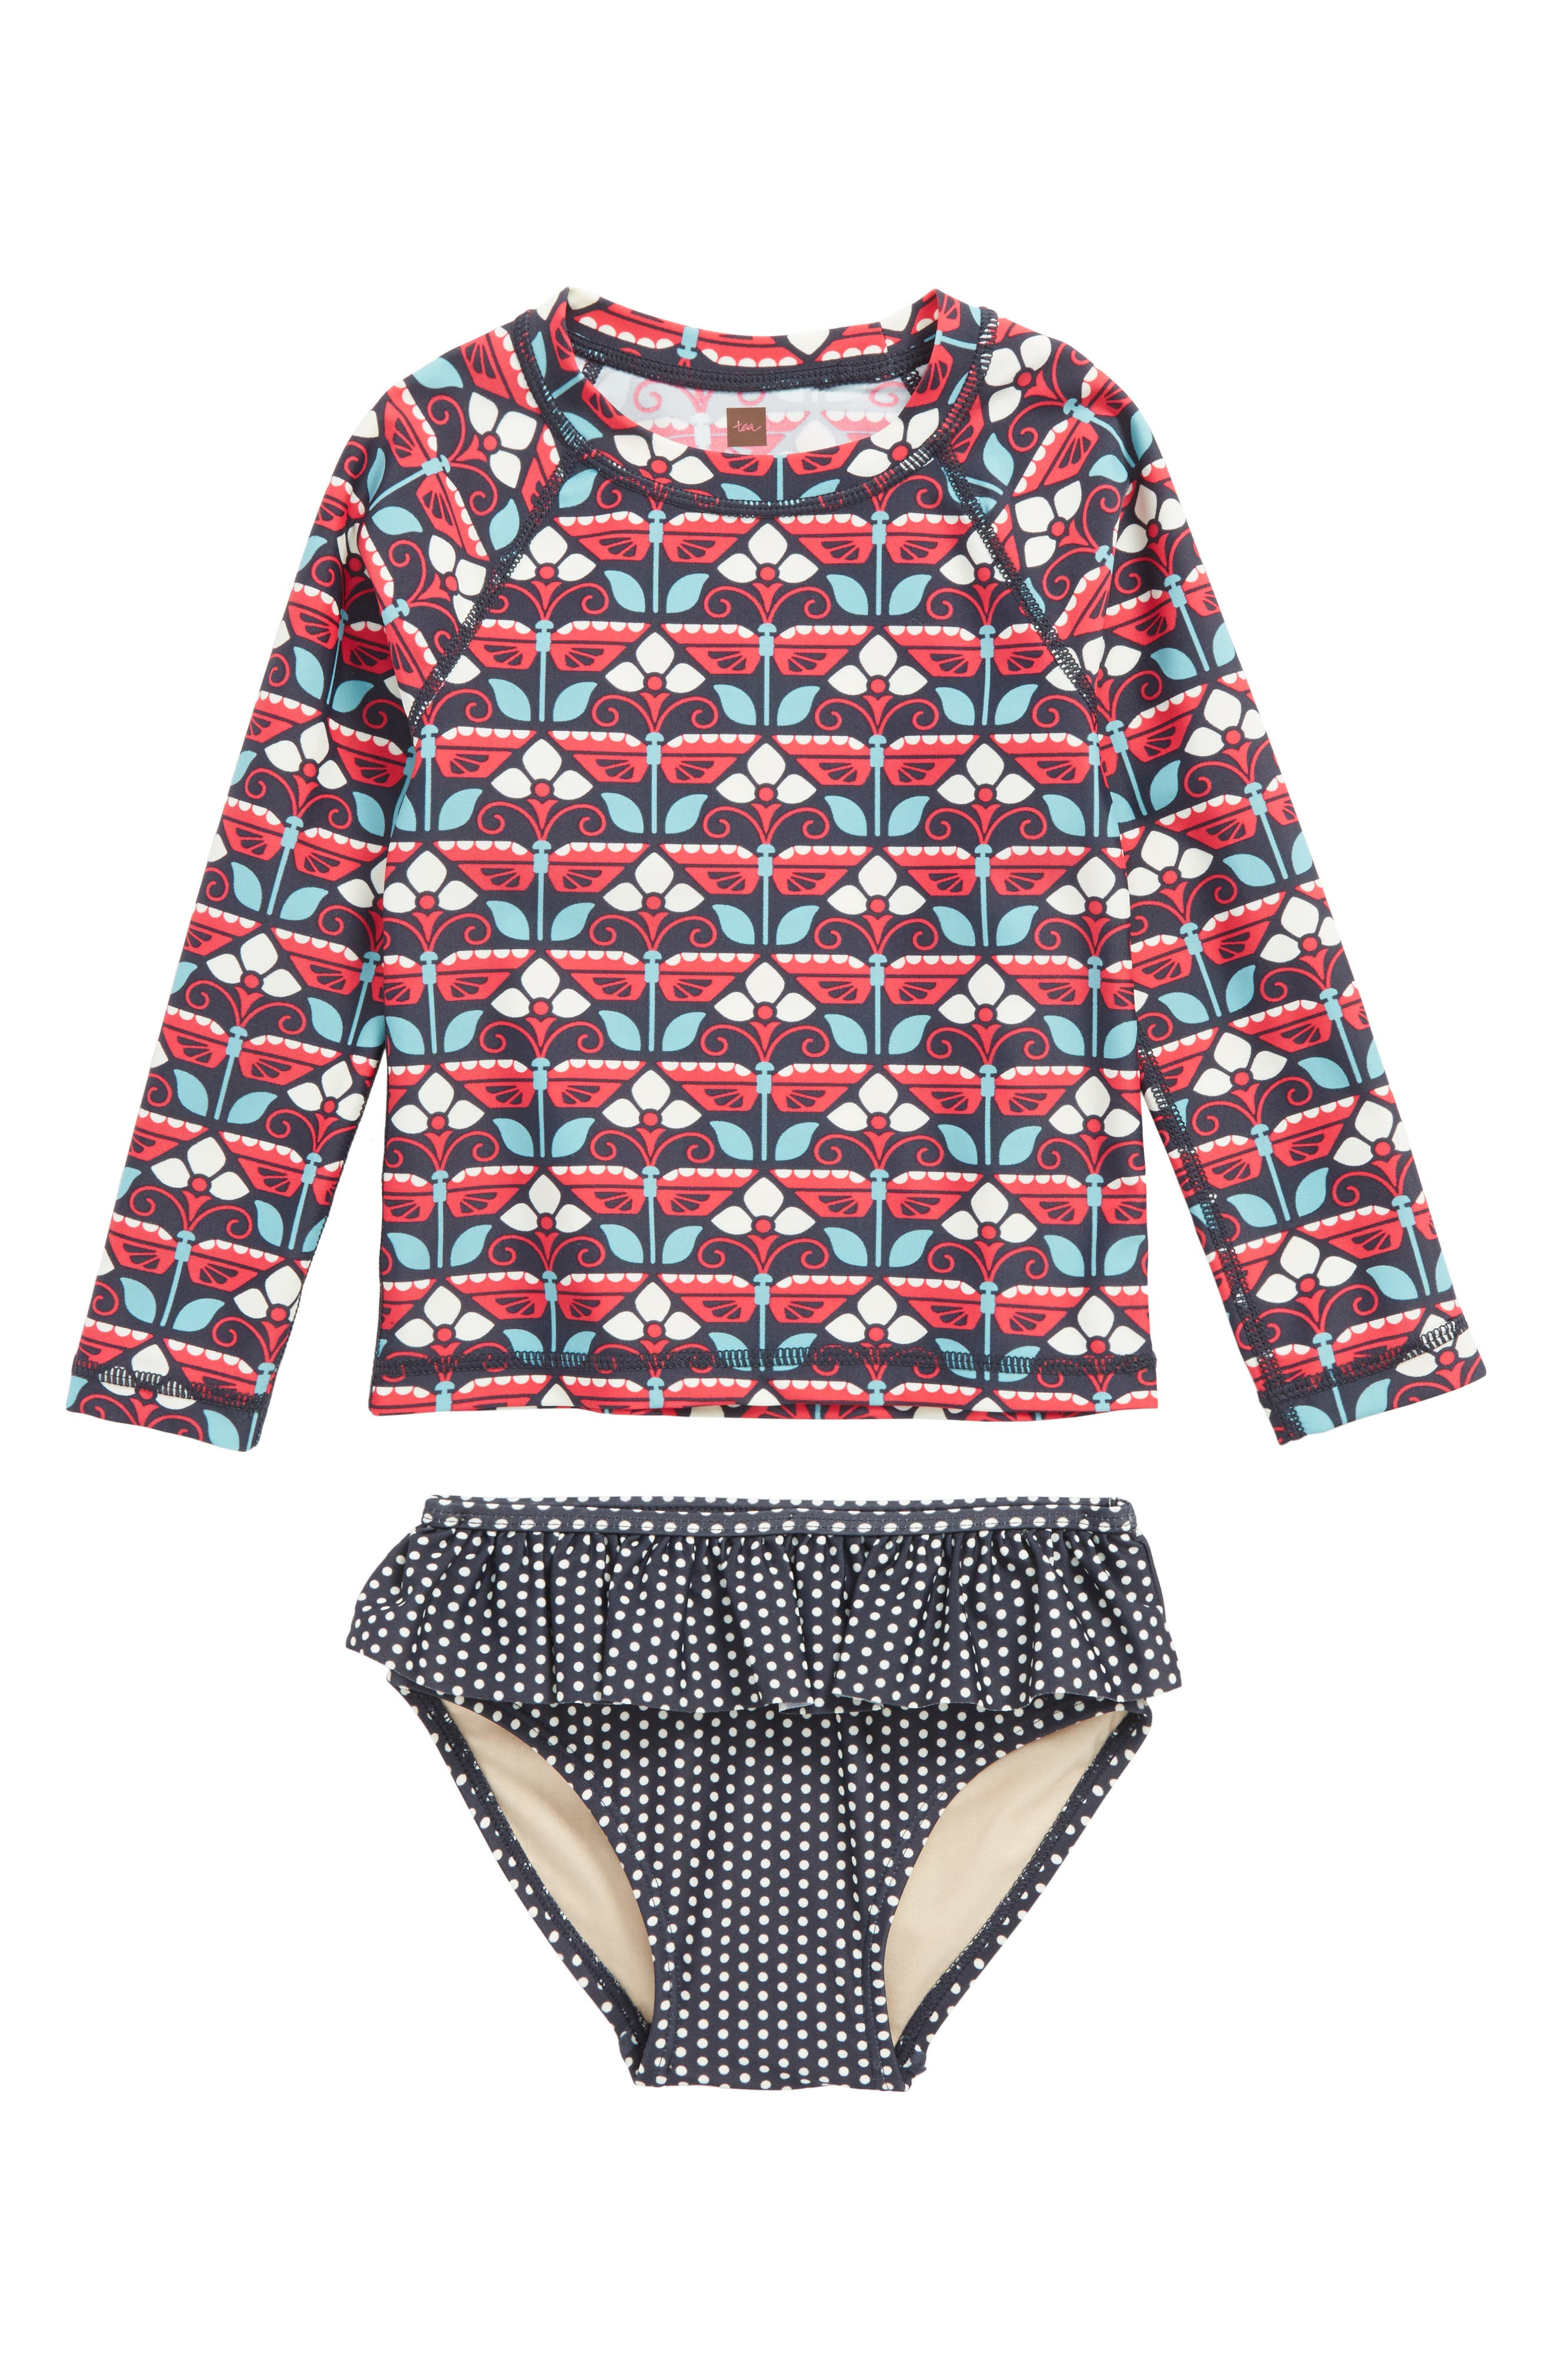 Main Image - Tea Collection Kaleidoscope Two-Piece Rashguard Swimsuit (Toddler Girls)